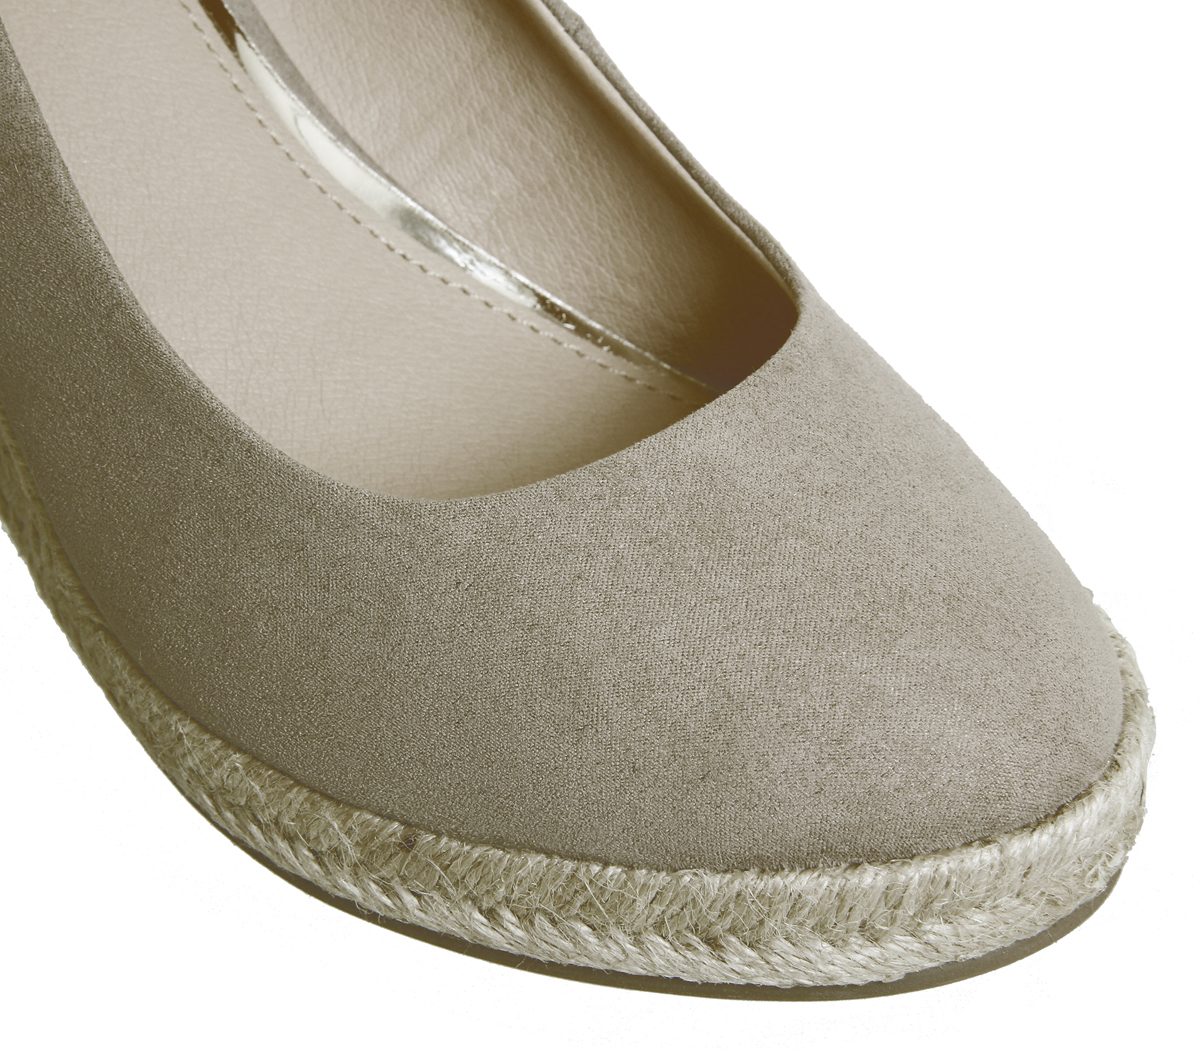 64964f3899b9 Womens Office Marbella Closed Toe Espadrilles Taupe Heels